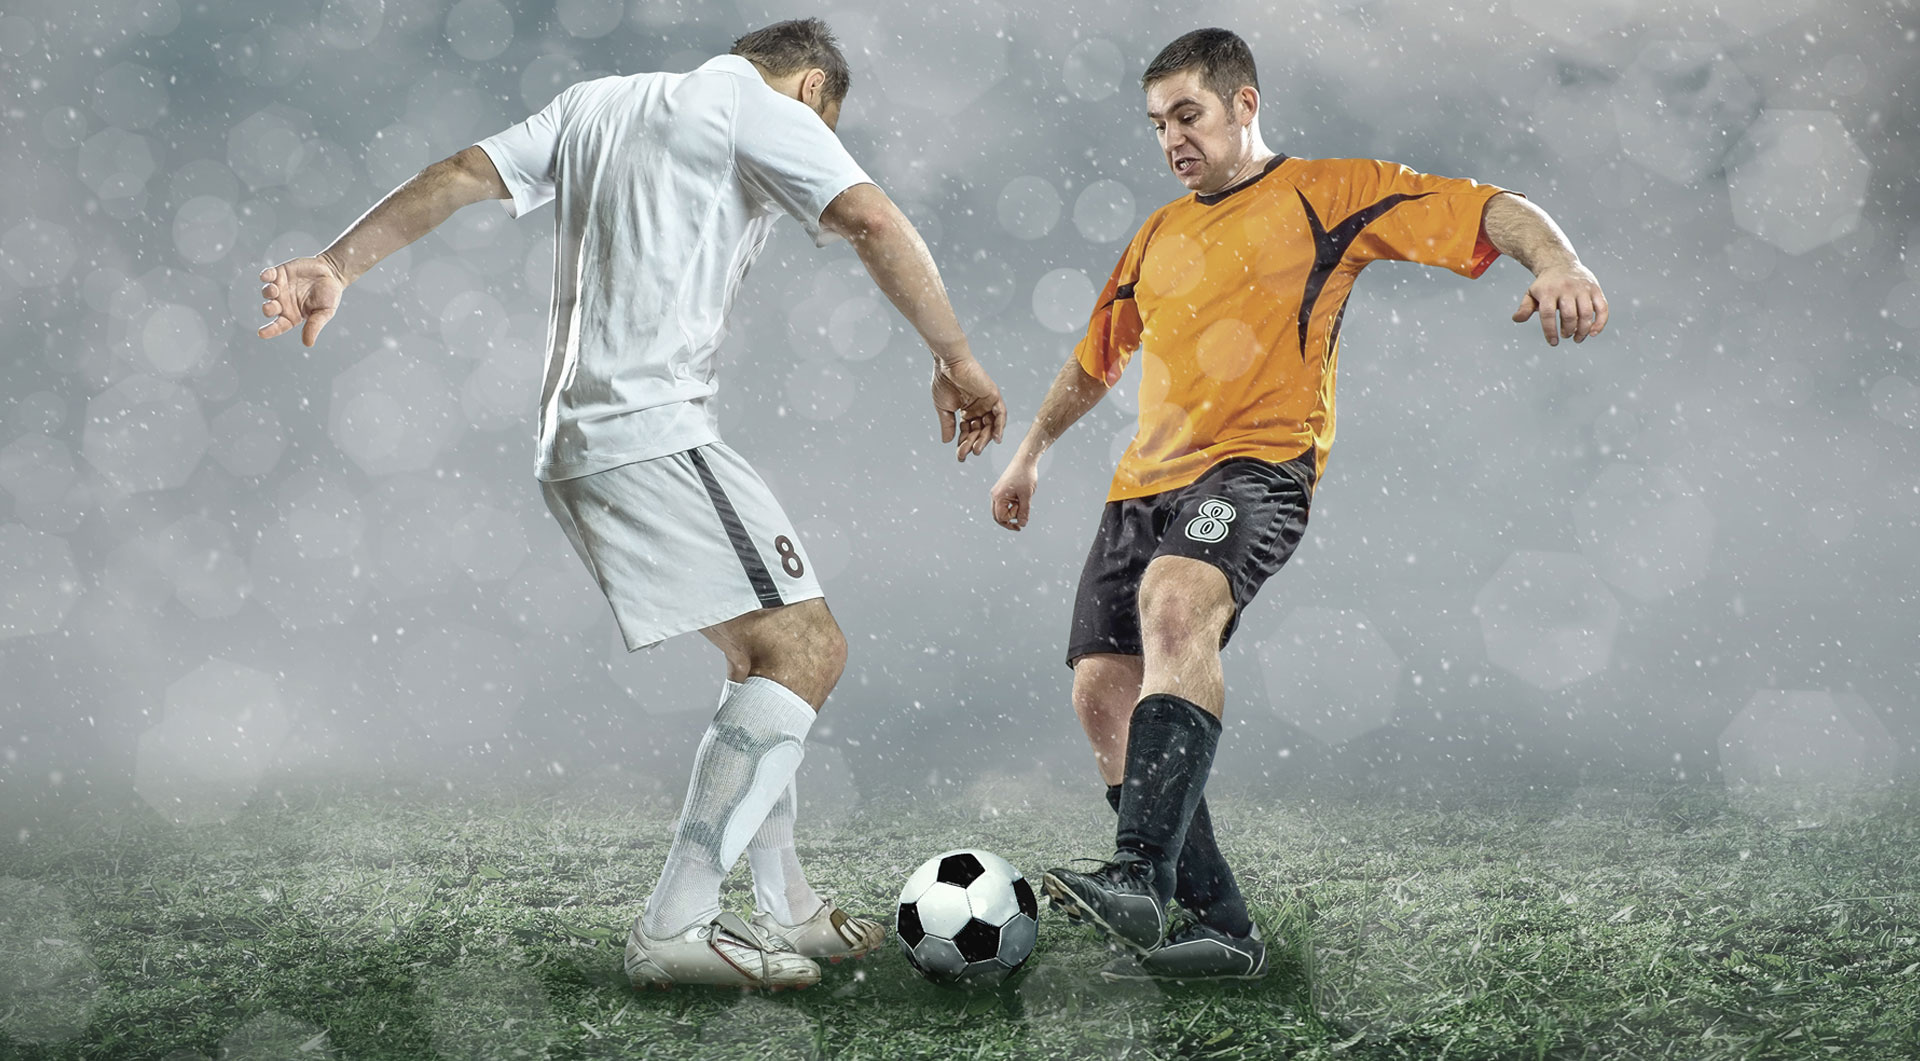 watch-1st-round-sara-errani-vs-kirsten-flipkens-us-open-2014-live